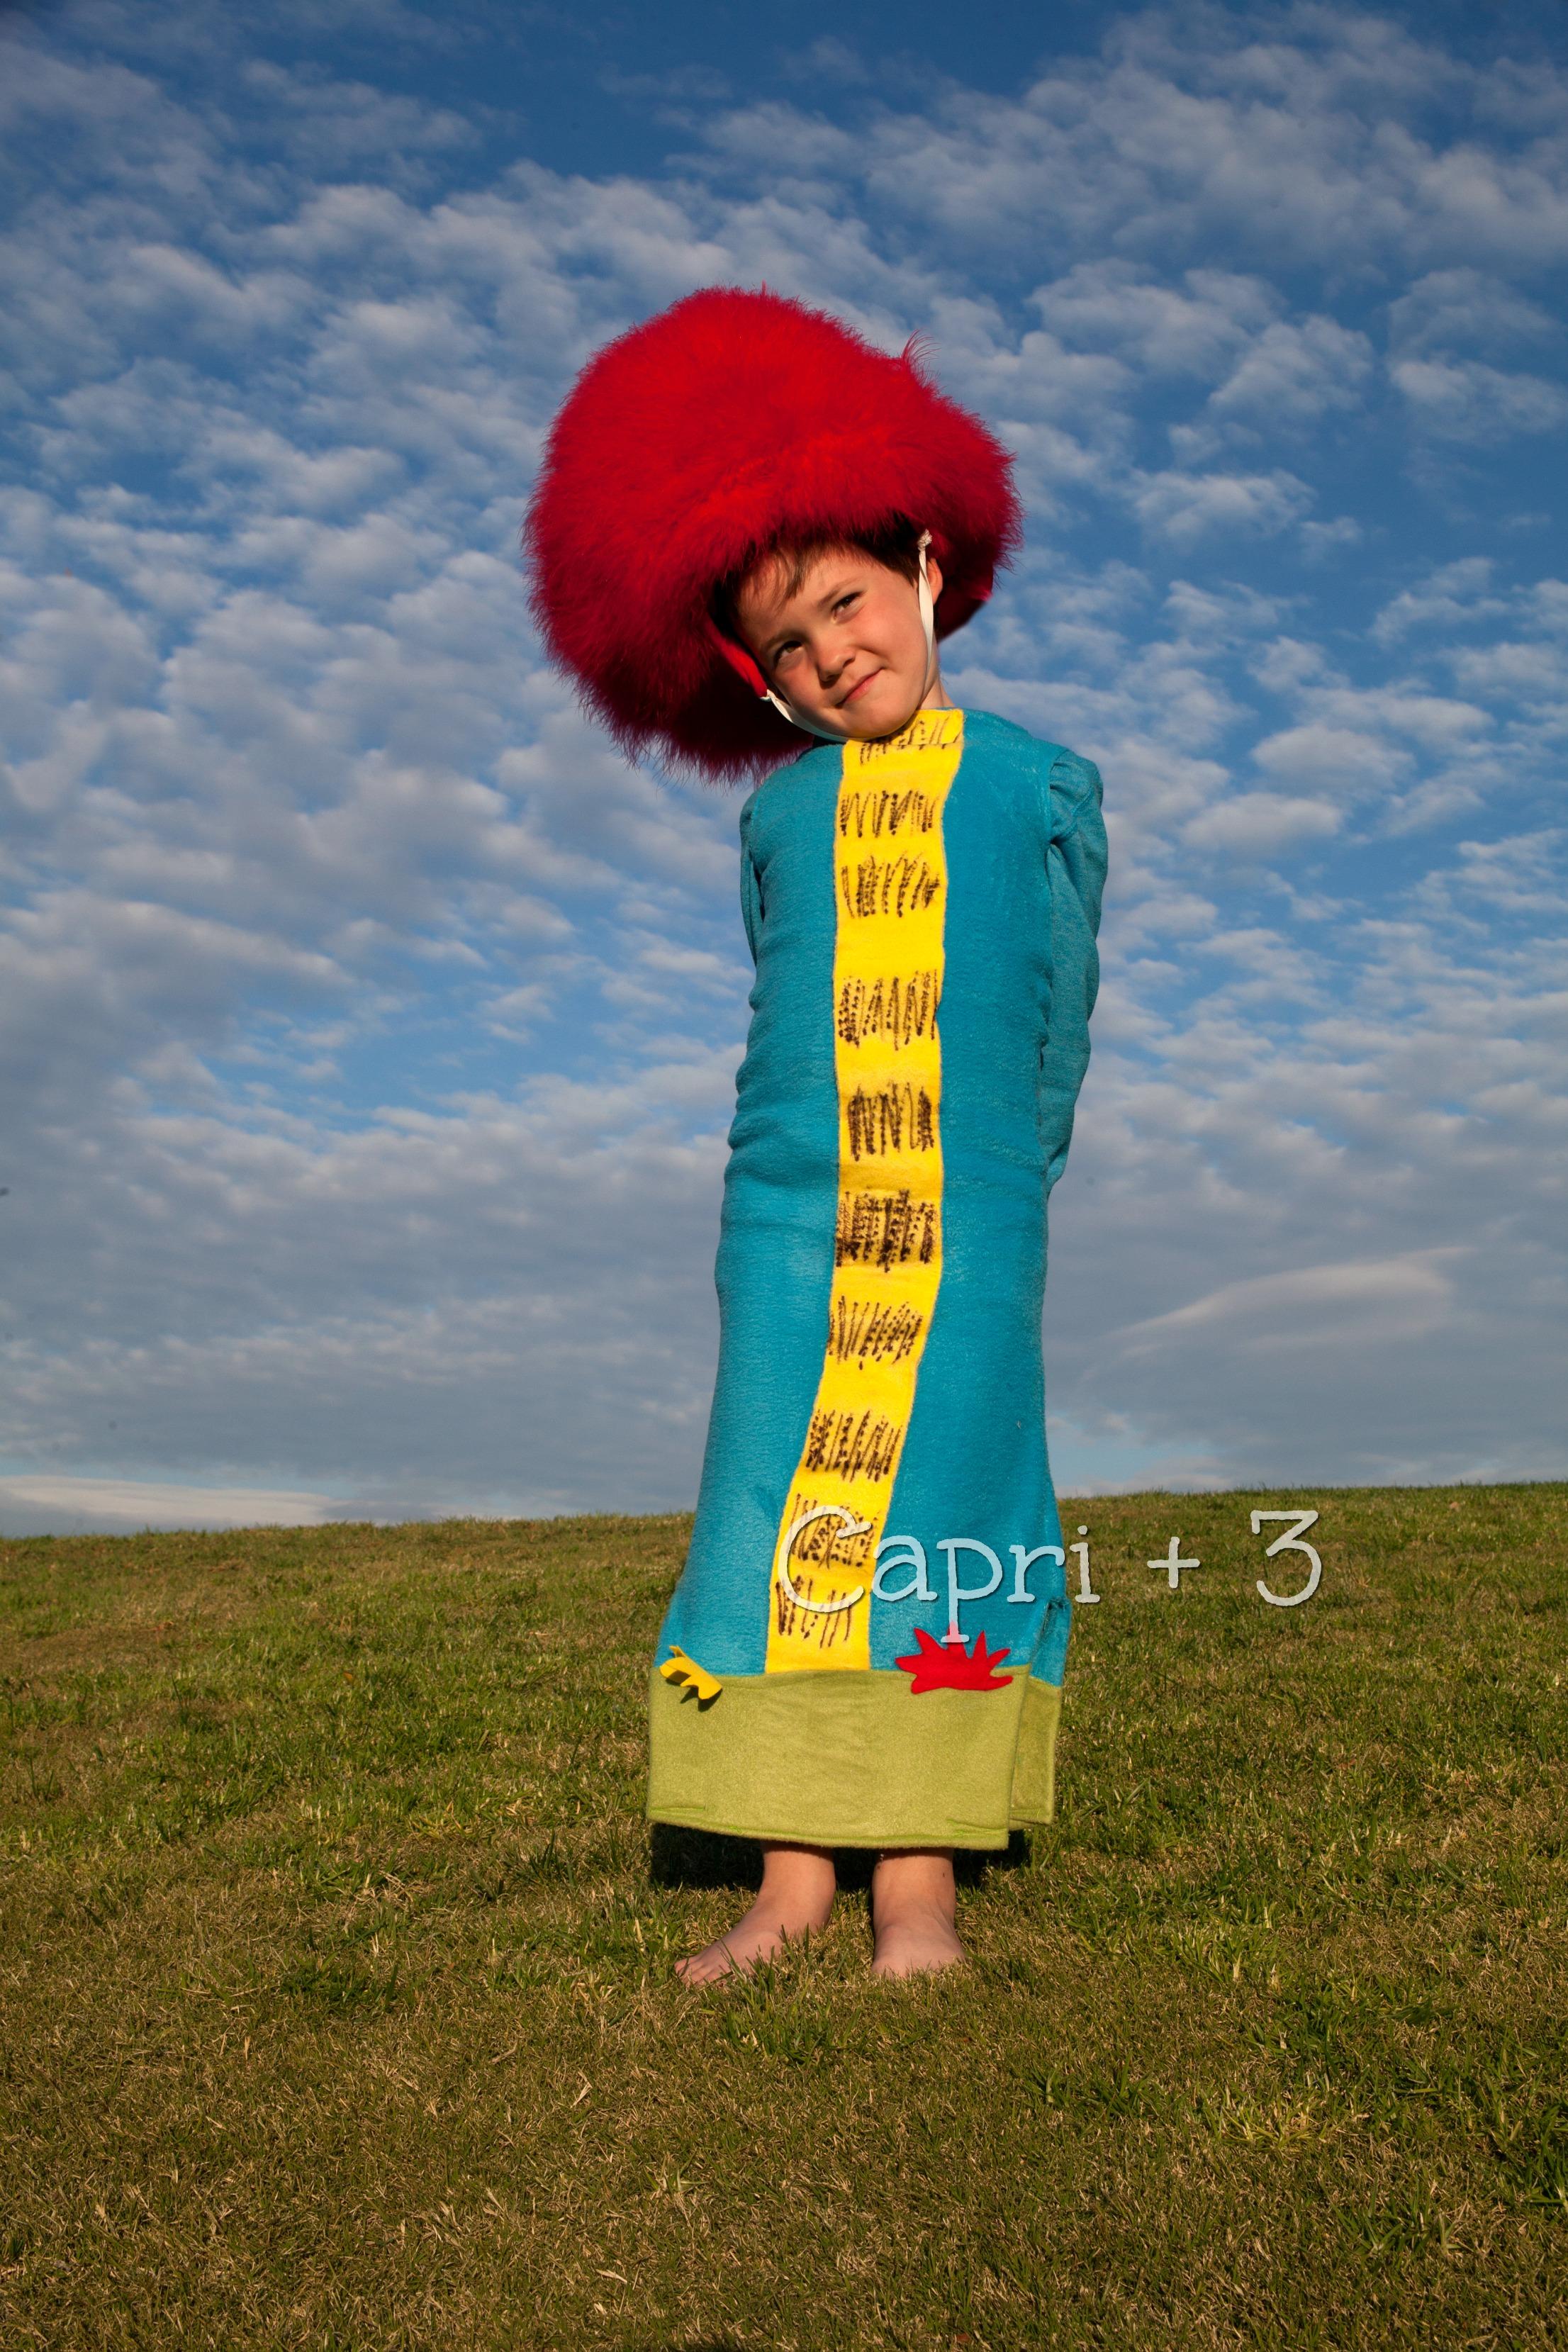 truffula-tree-themed-costume-the-lorax